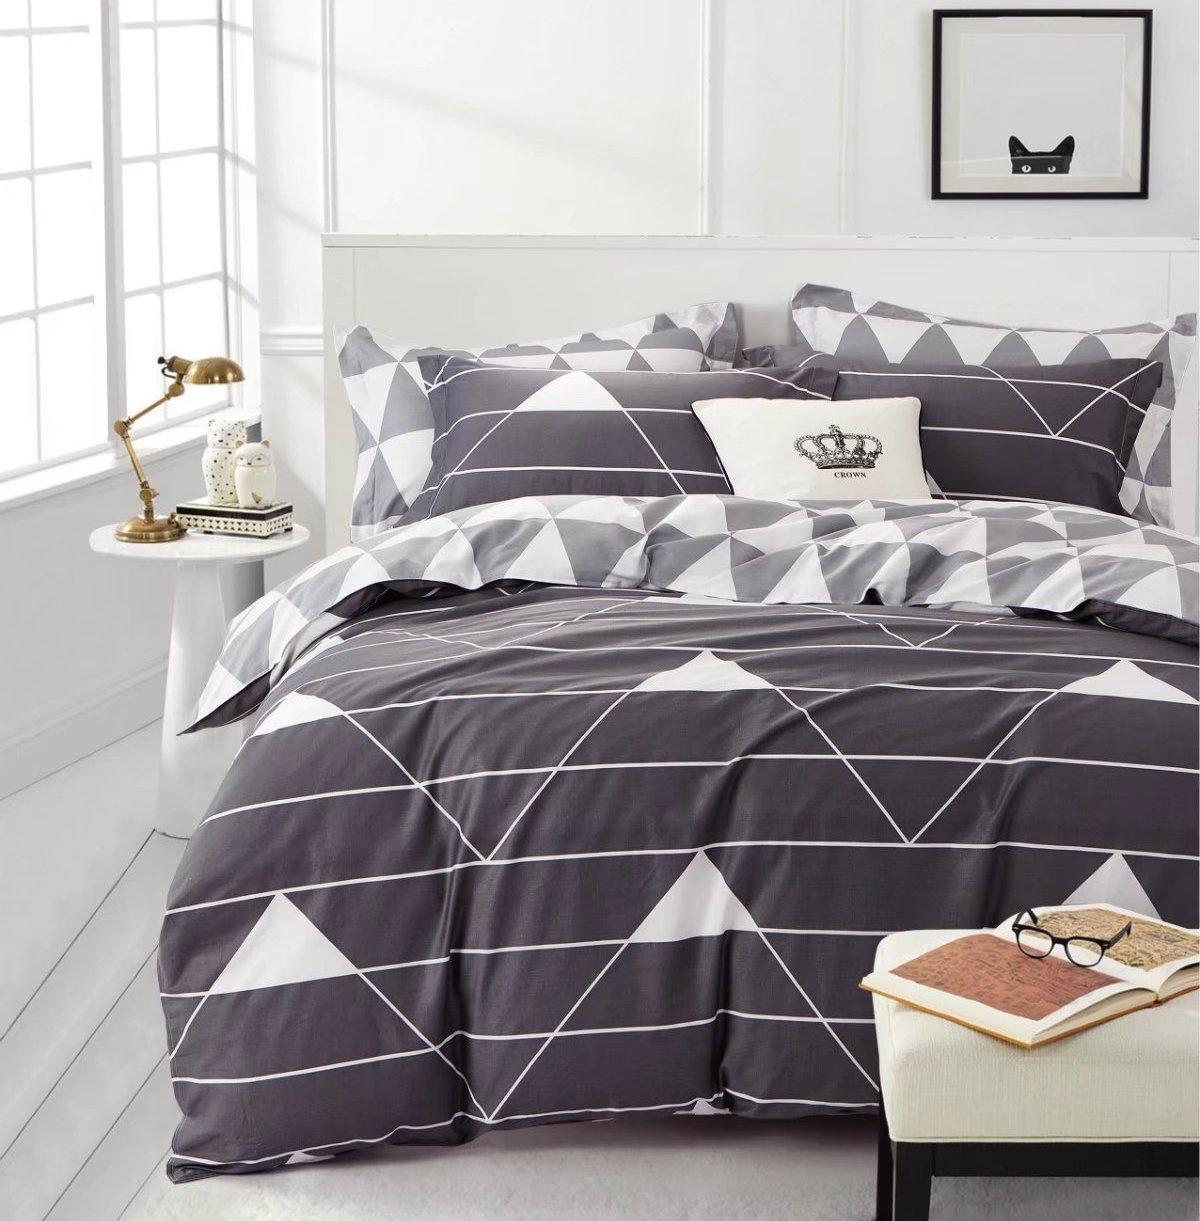 Minimal Style Geometric Shapes Duvet Quilt Cover Scandinavian Midcentury Modern Geo Print 100-percent Cotton Bedding Set Soft Casual Simplistic Triangle Stripes Chevron Pattern (King, Grey)